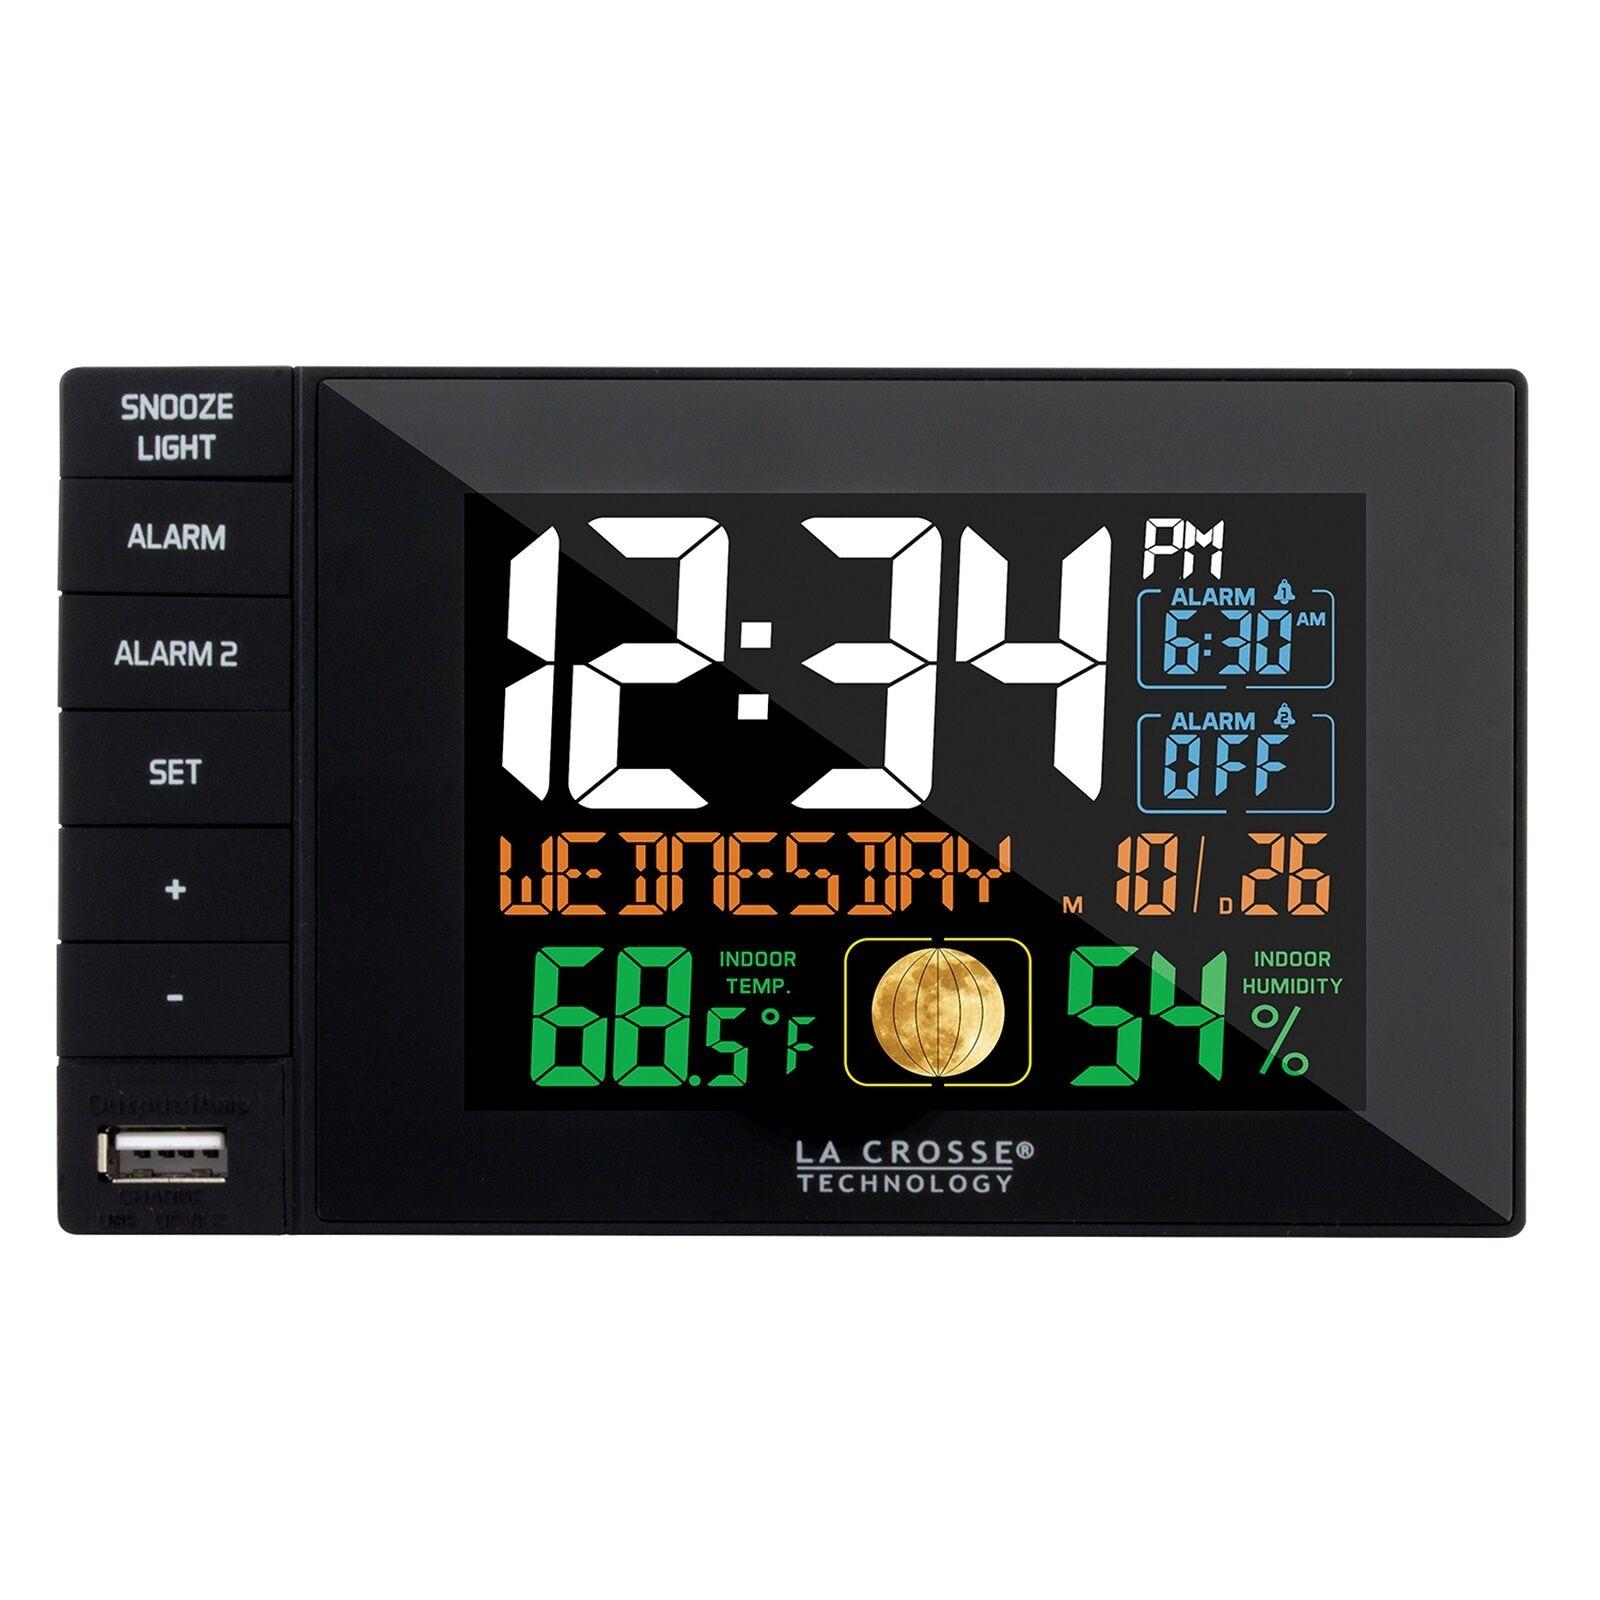 La Crosse Technology C87207 C87061 Color Dual Alarm Clock wi